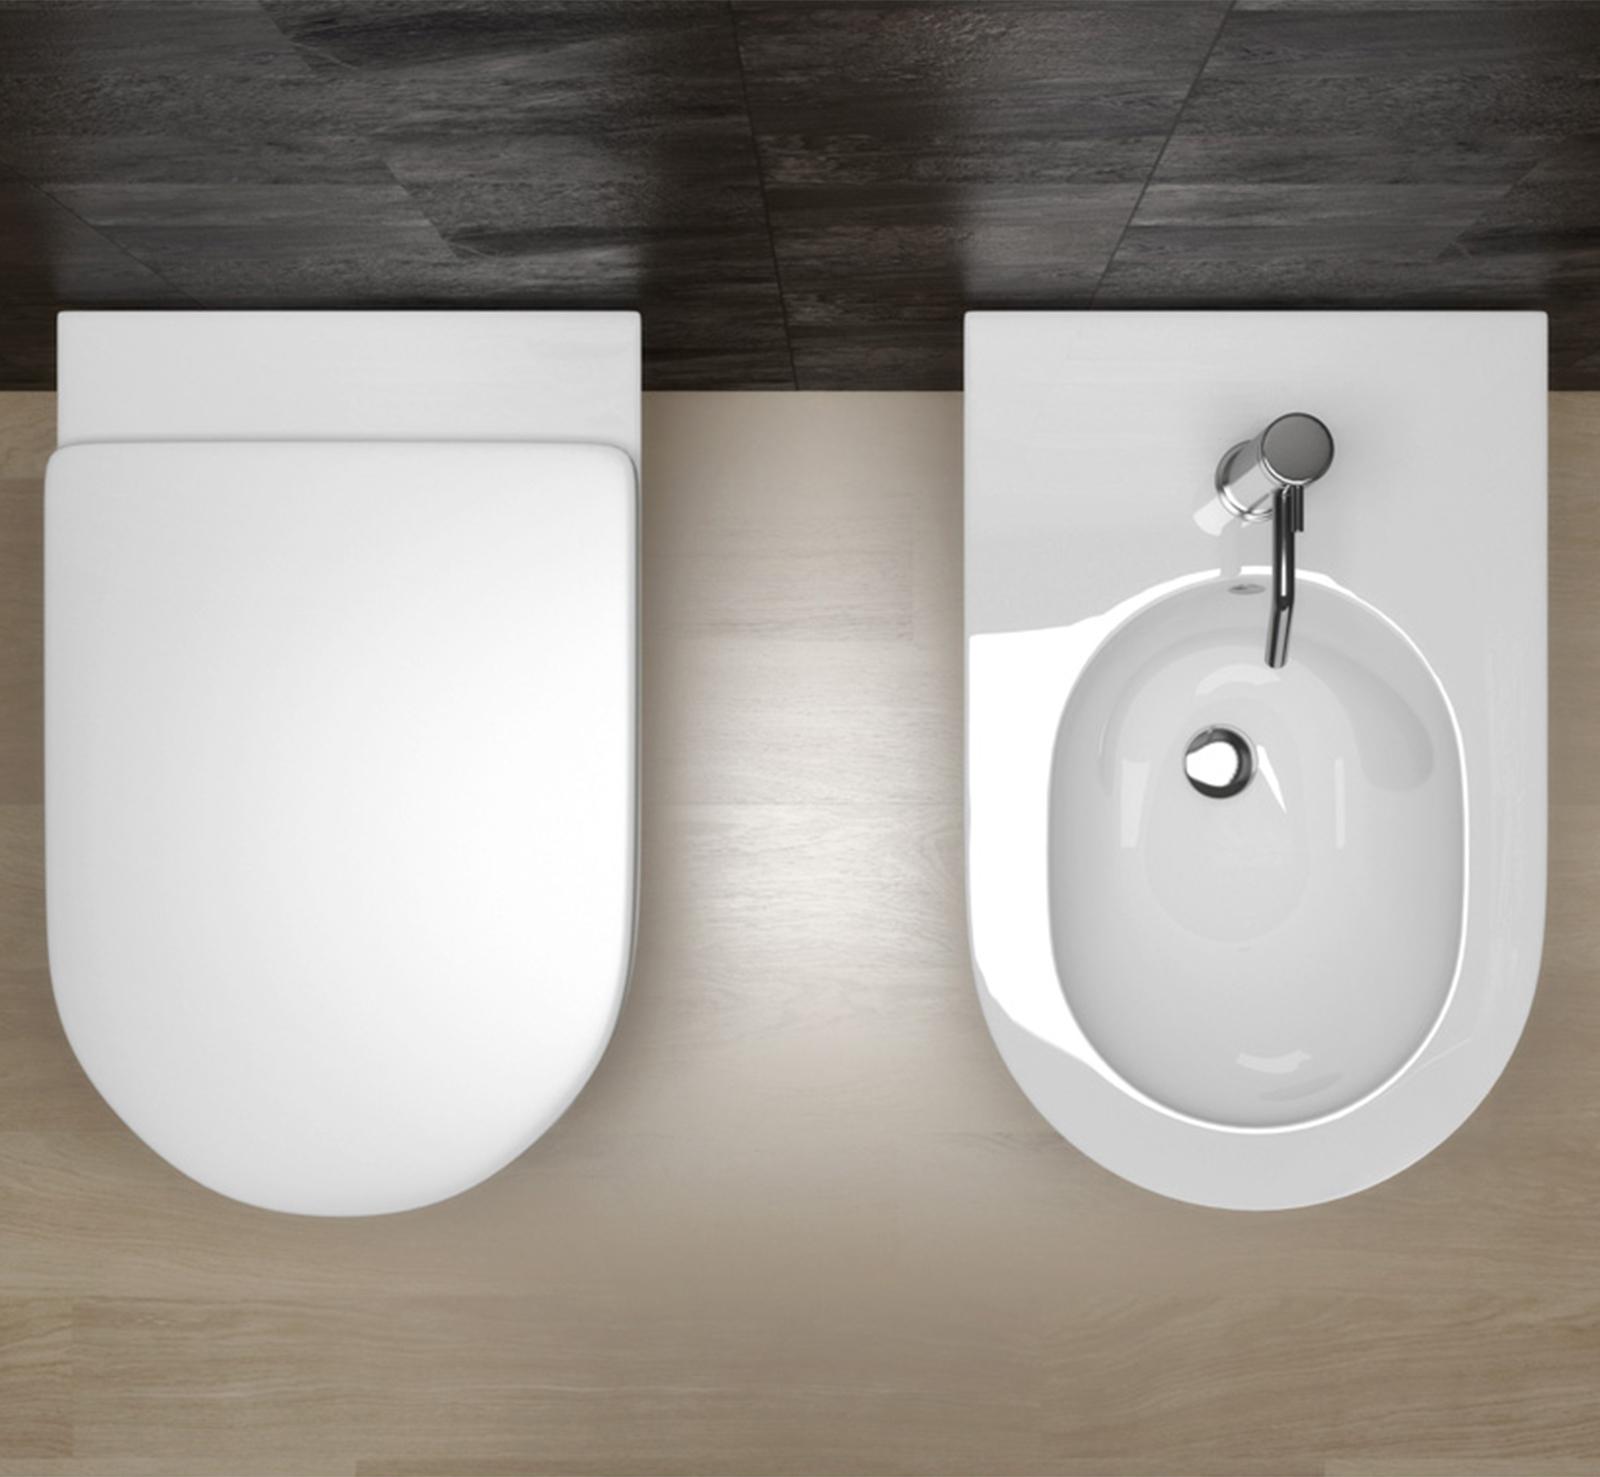 sanitari sospesi design minimal ceramica